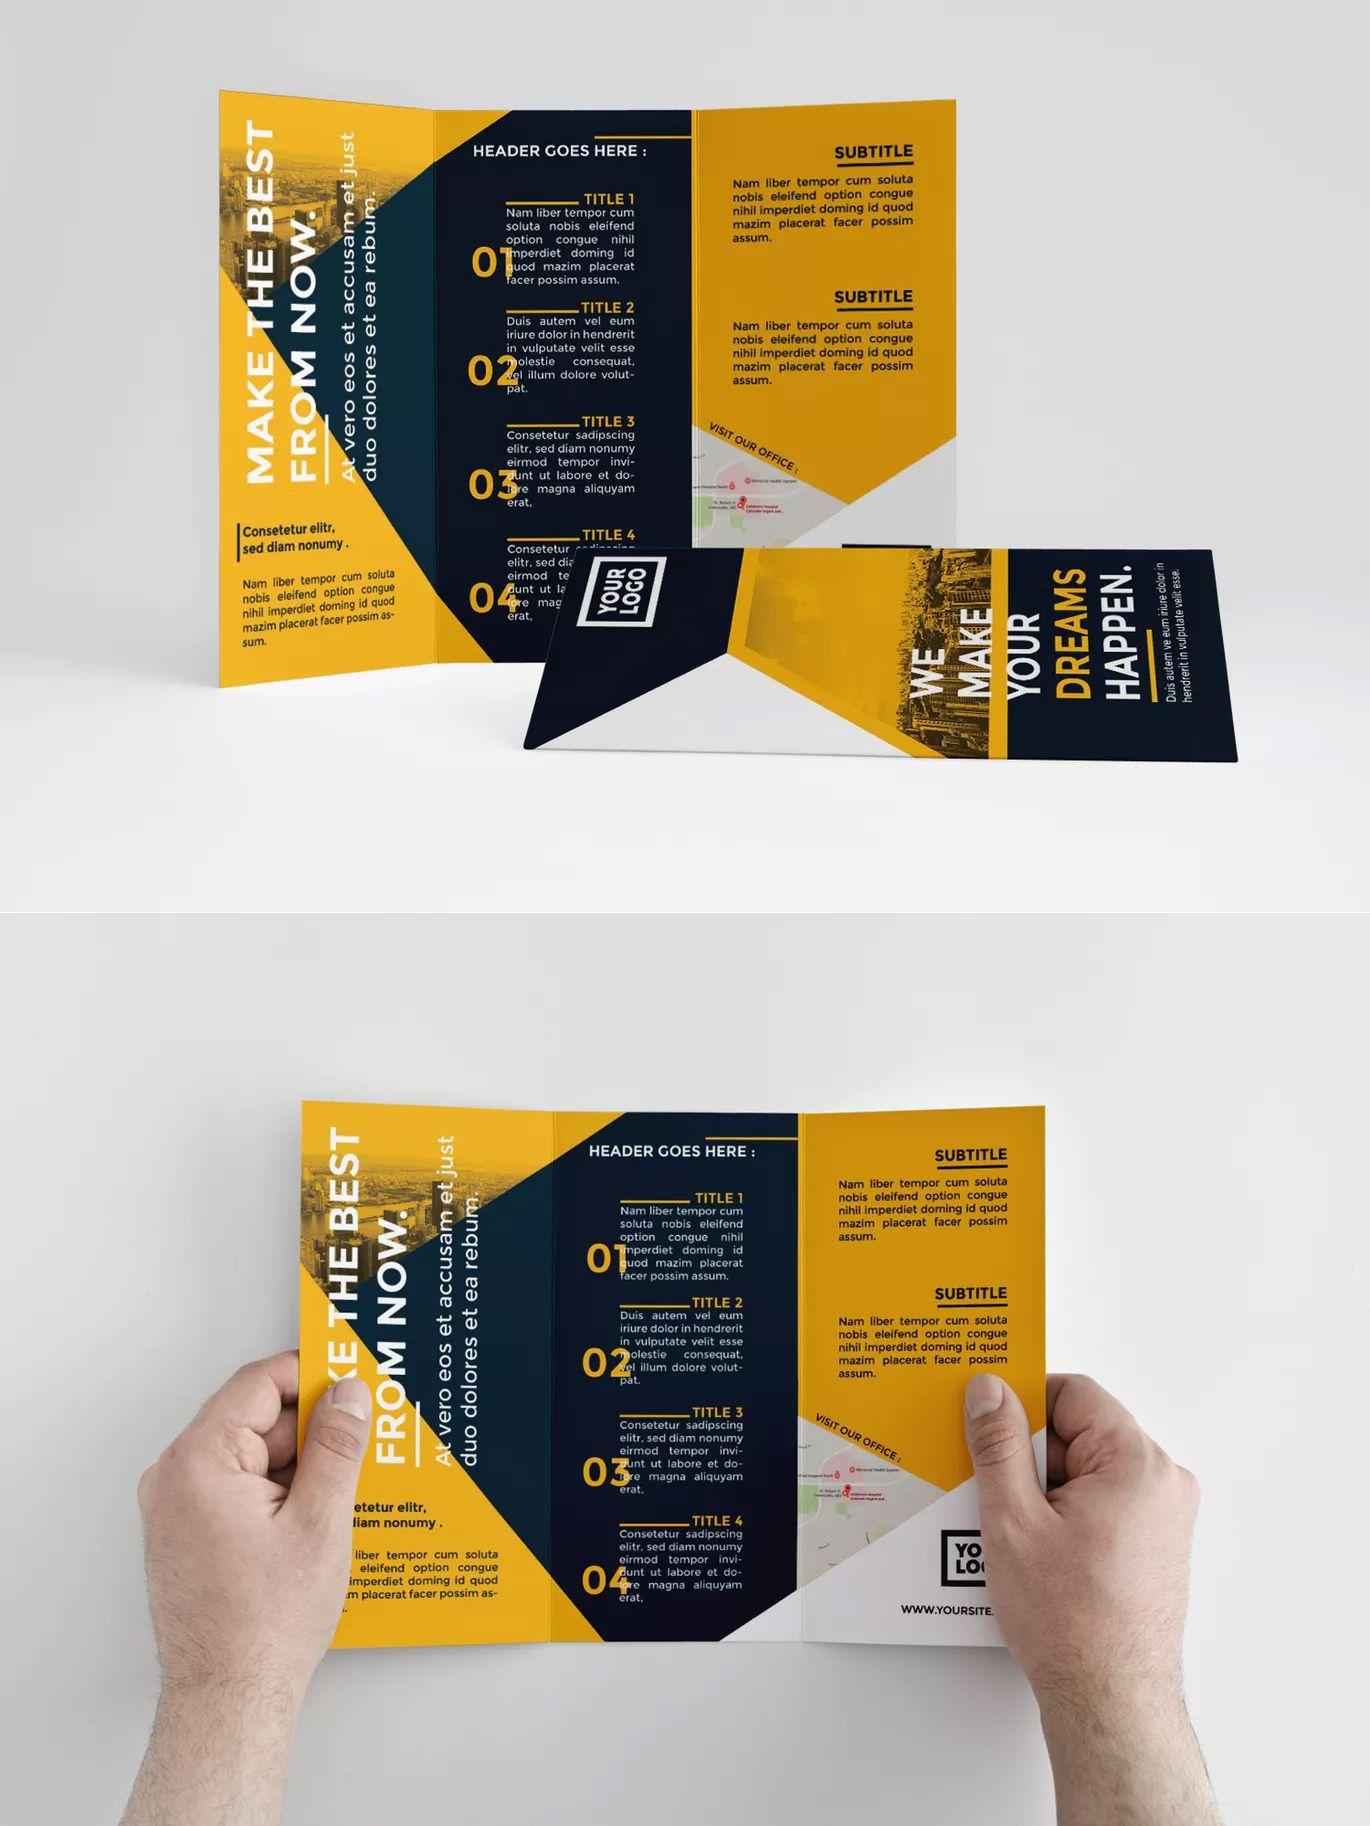 000 Shocking Indesign Trifold Brochure Template Inspiration  Tri Fold A4 Bi Free DownloadFull